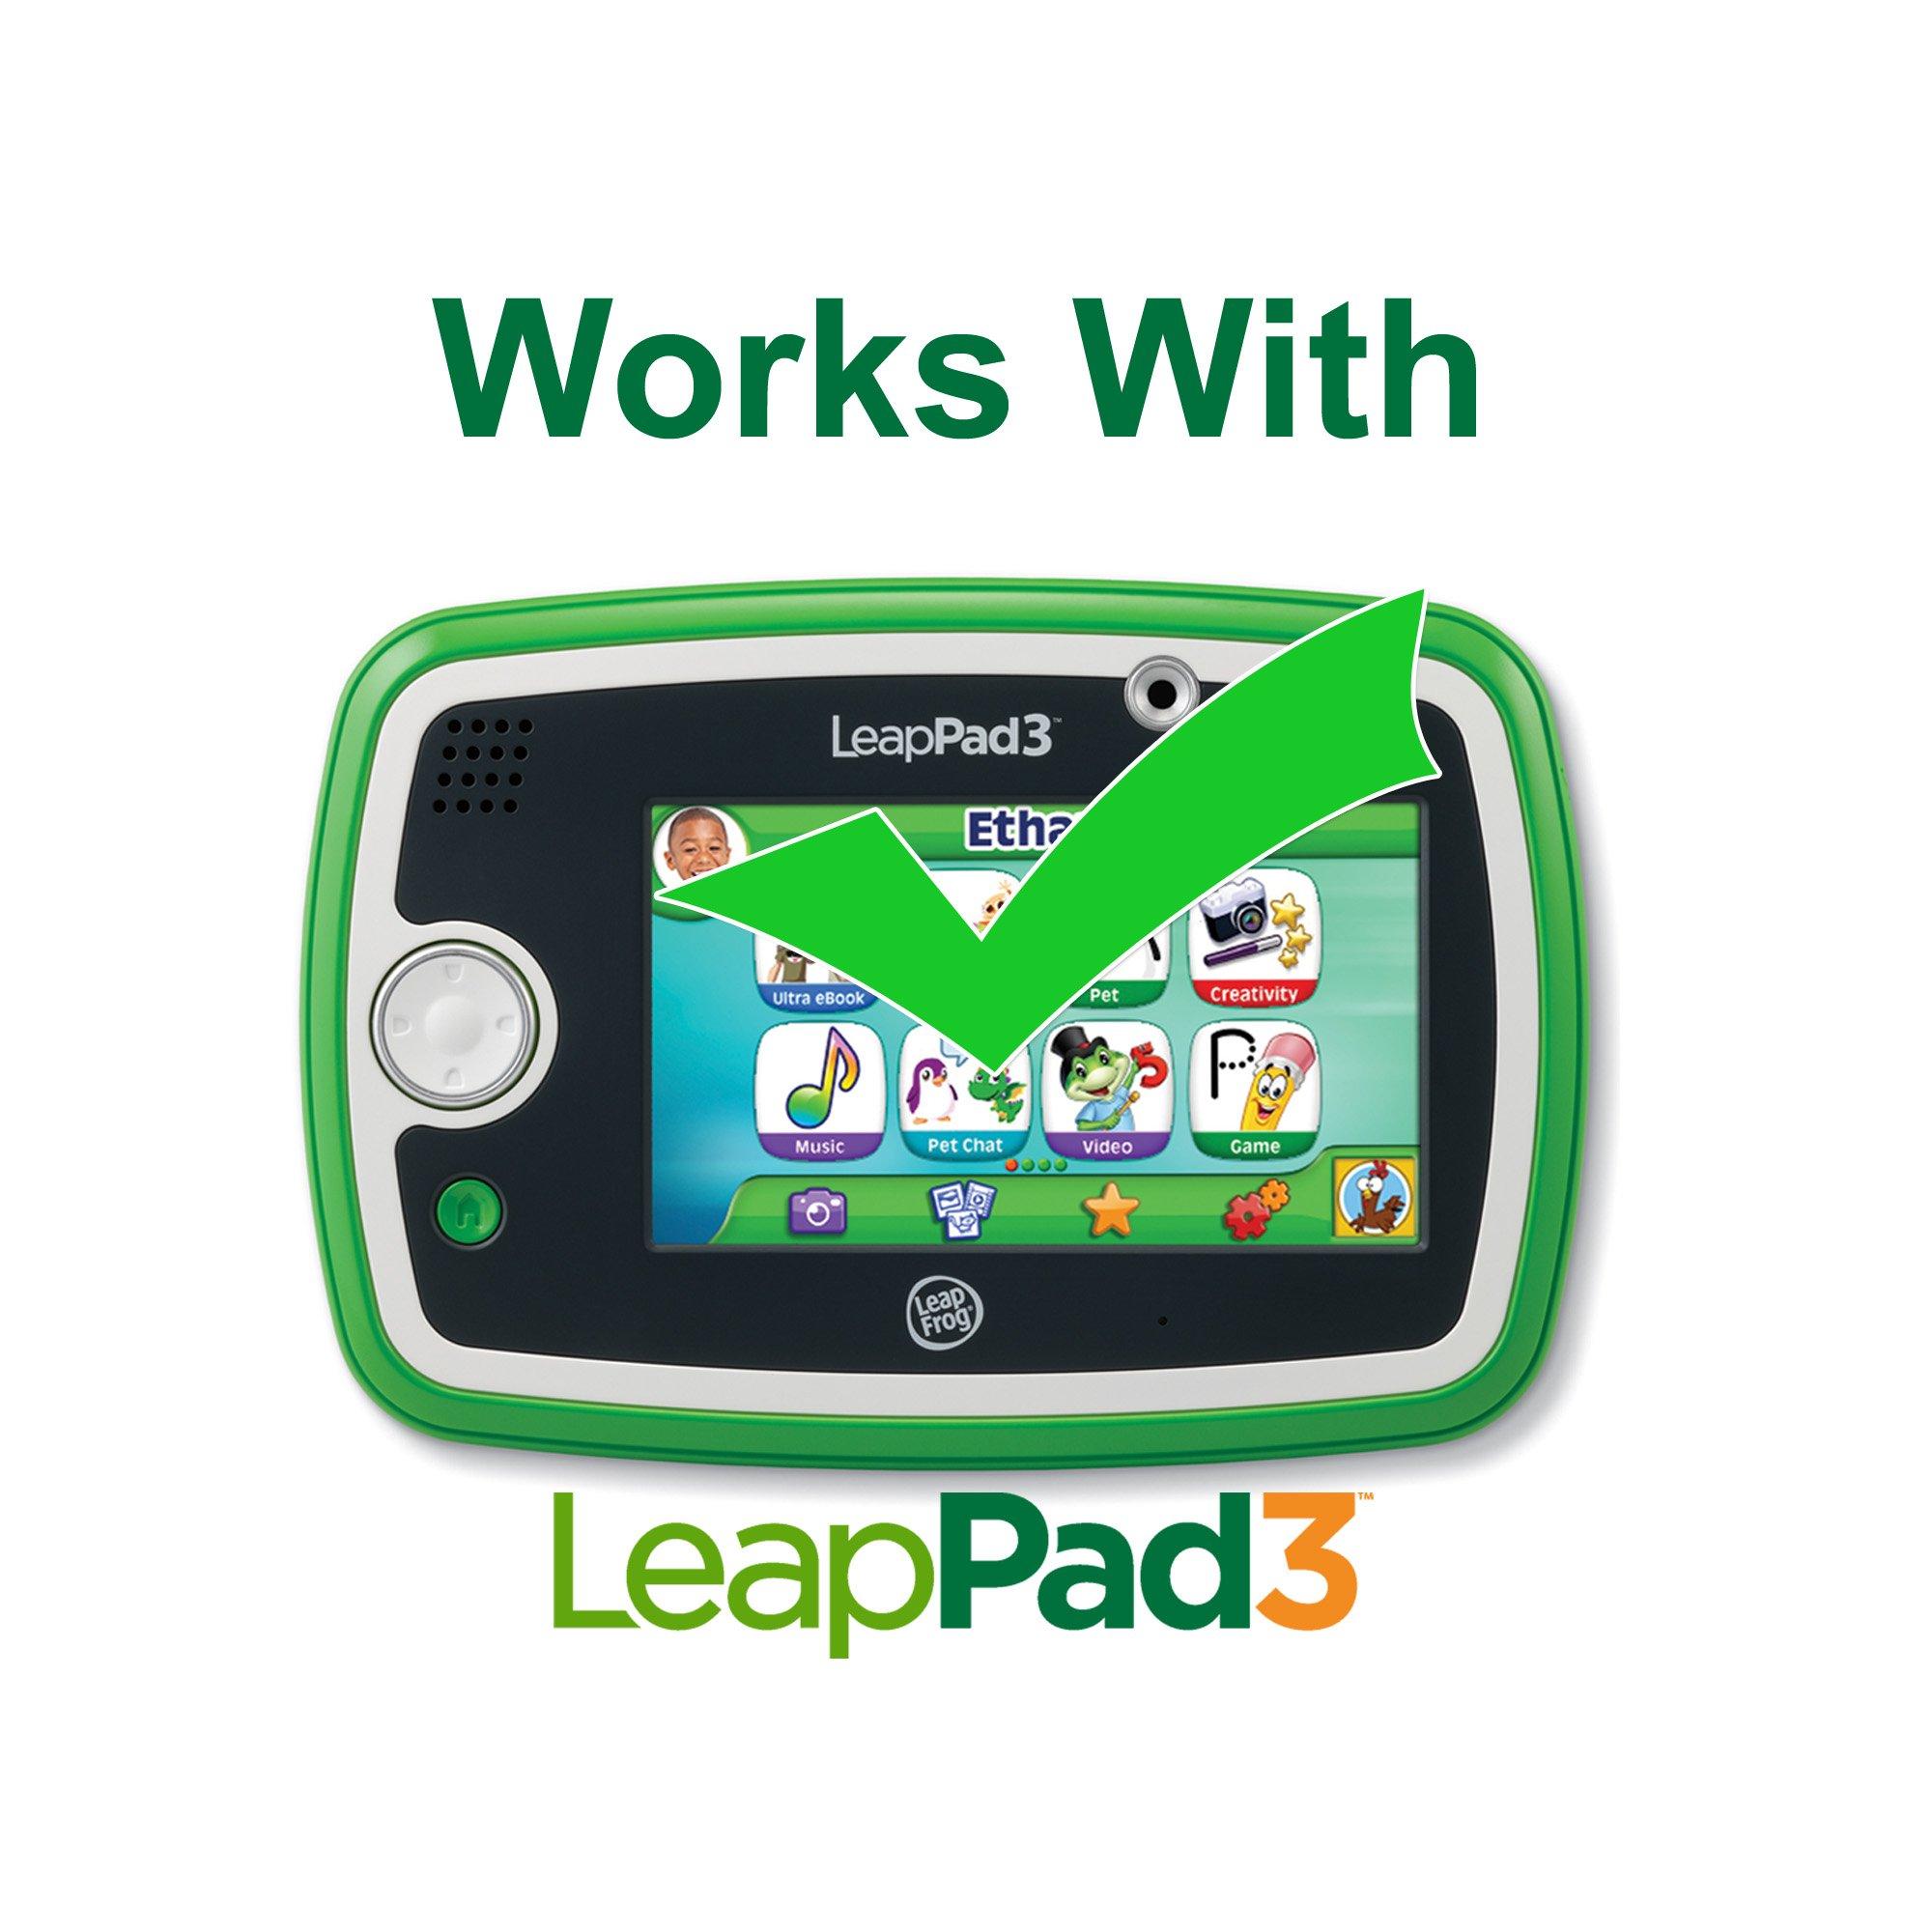 LeapFrog LeapFrog LeapPad3 Gel Skin, Purple (made to fit LeapPad3) by LeapFrog (Image #5)